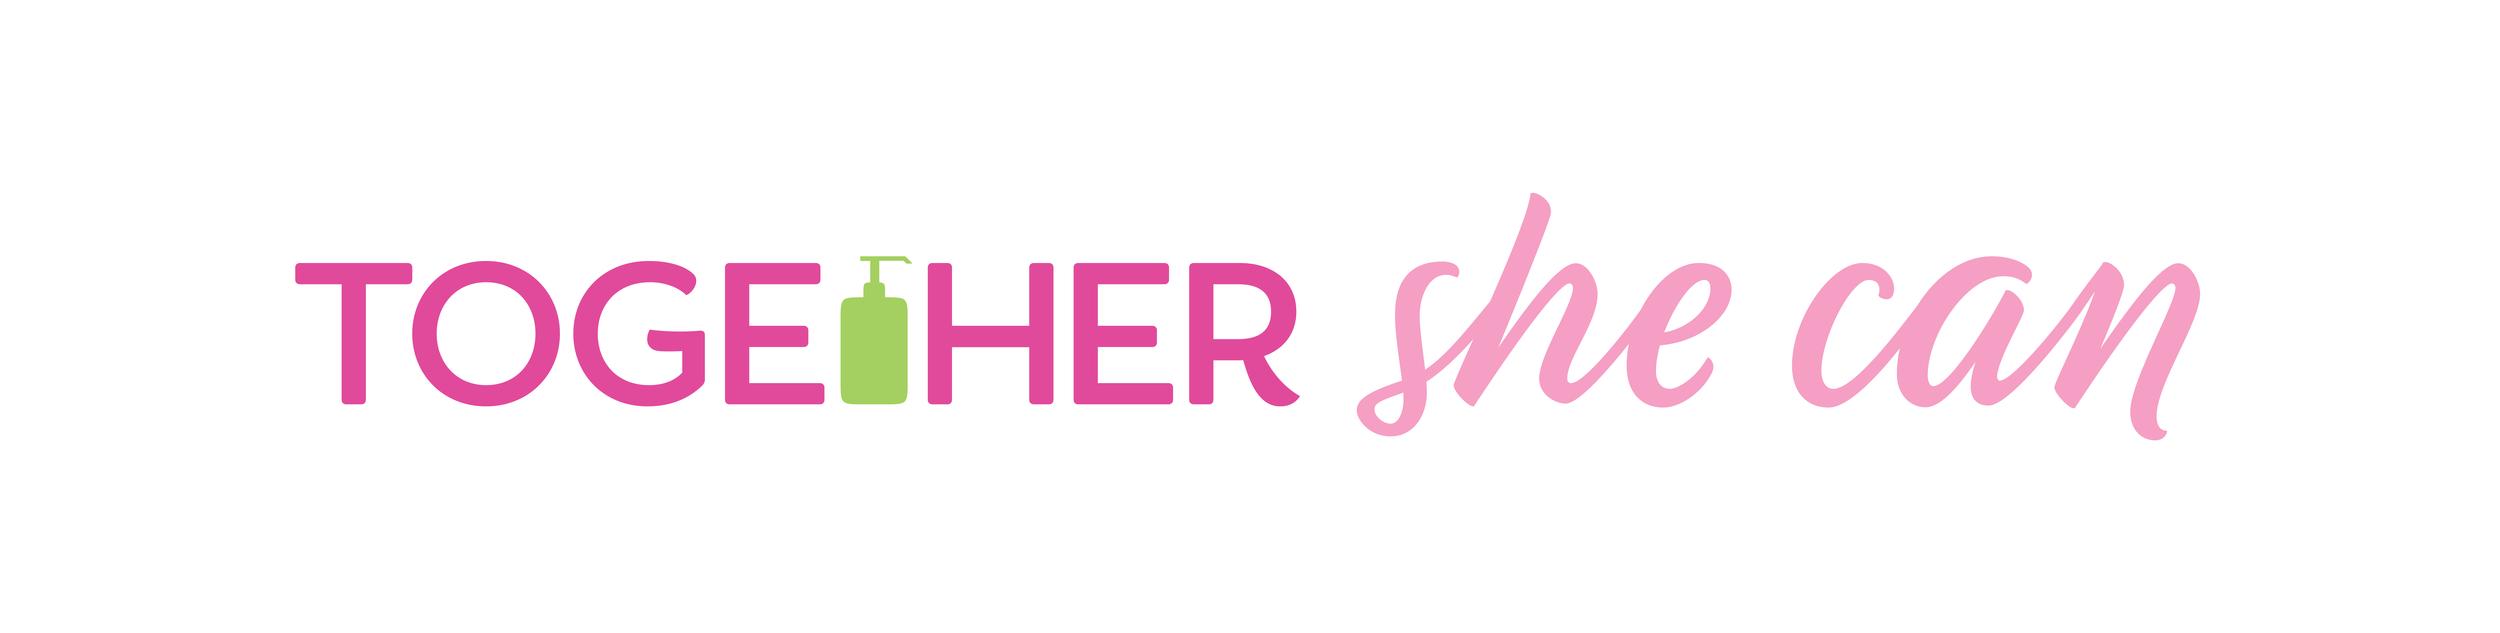 togethershecan-logo-horizontal-01.png